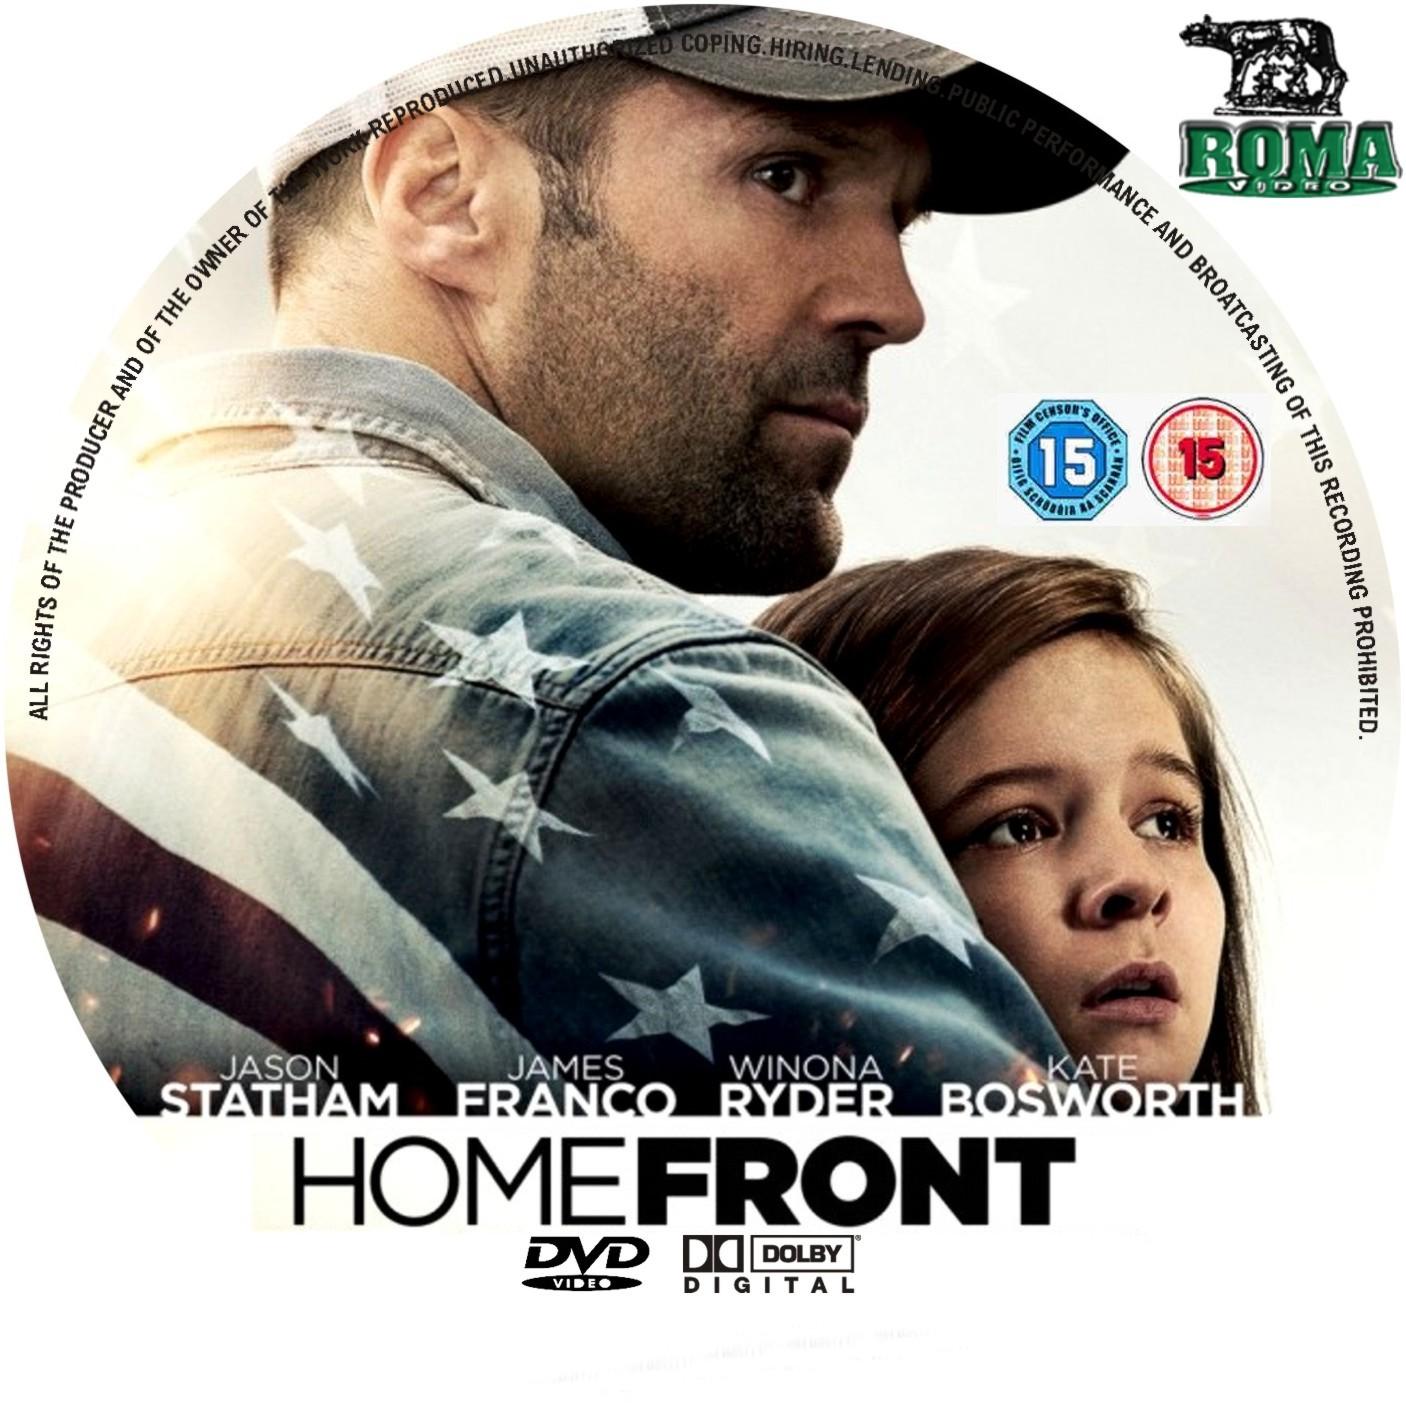 Homefront 2013 Max Potlaccd Cover